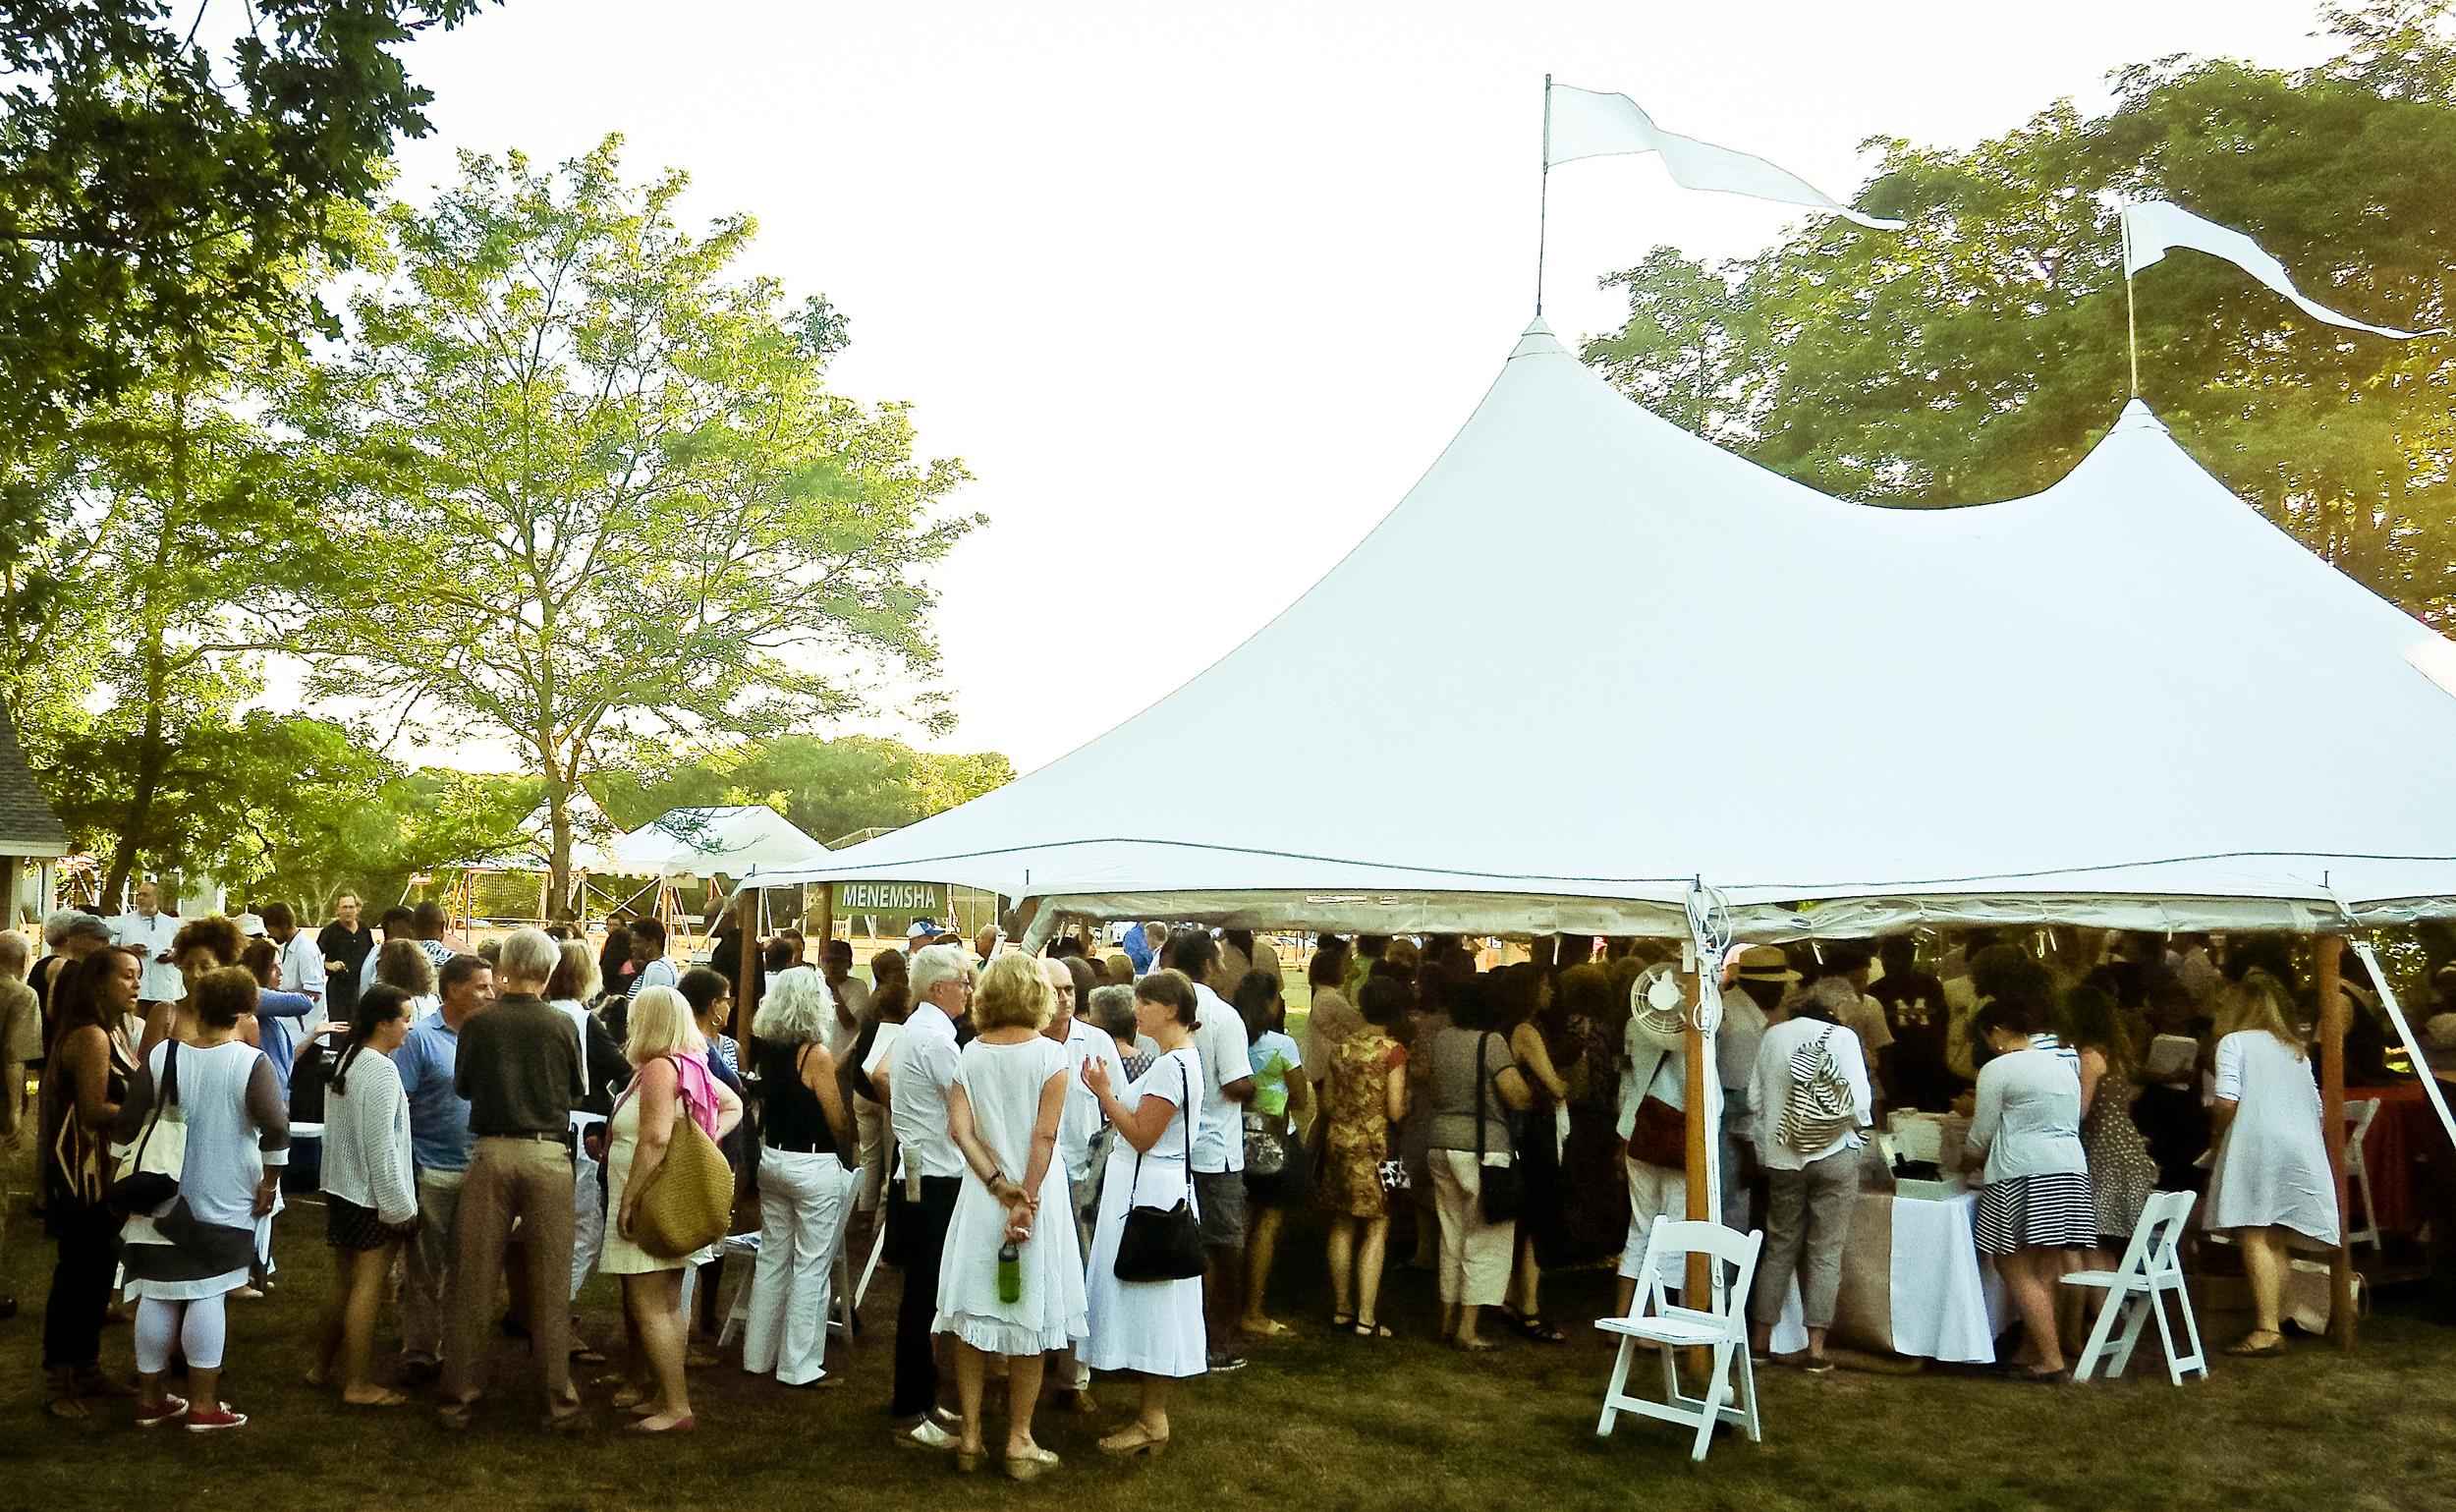 2015 Martha's Vineyard Book Festival